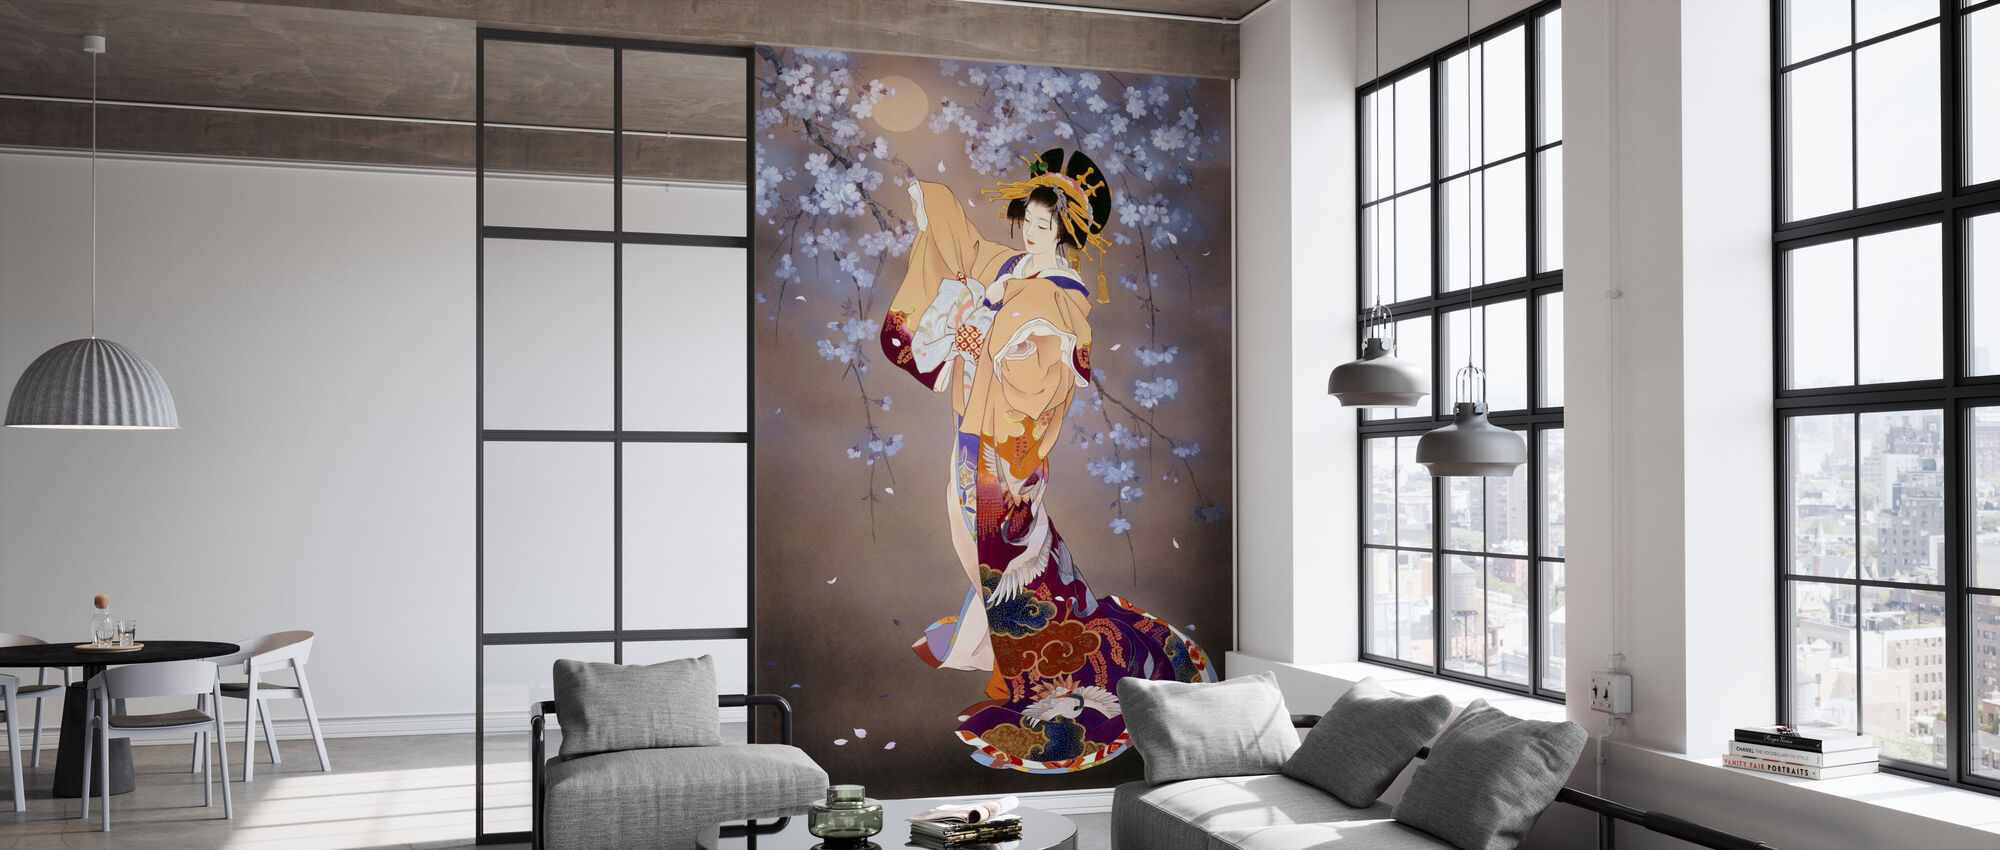 Yoi - Wallpaper - Office